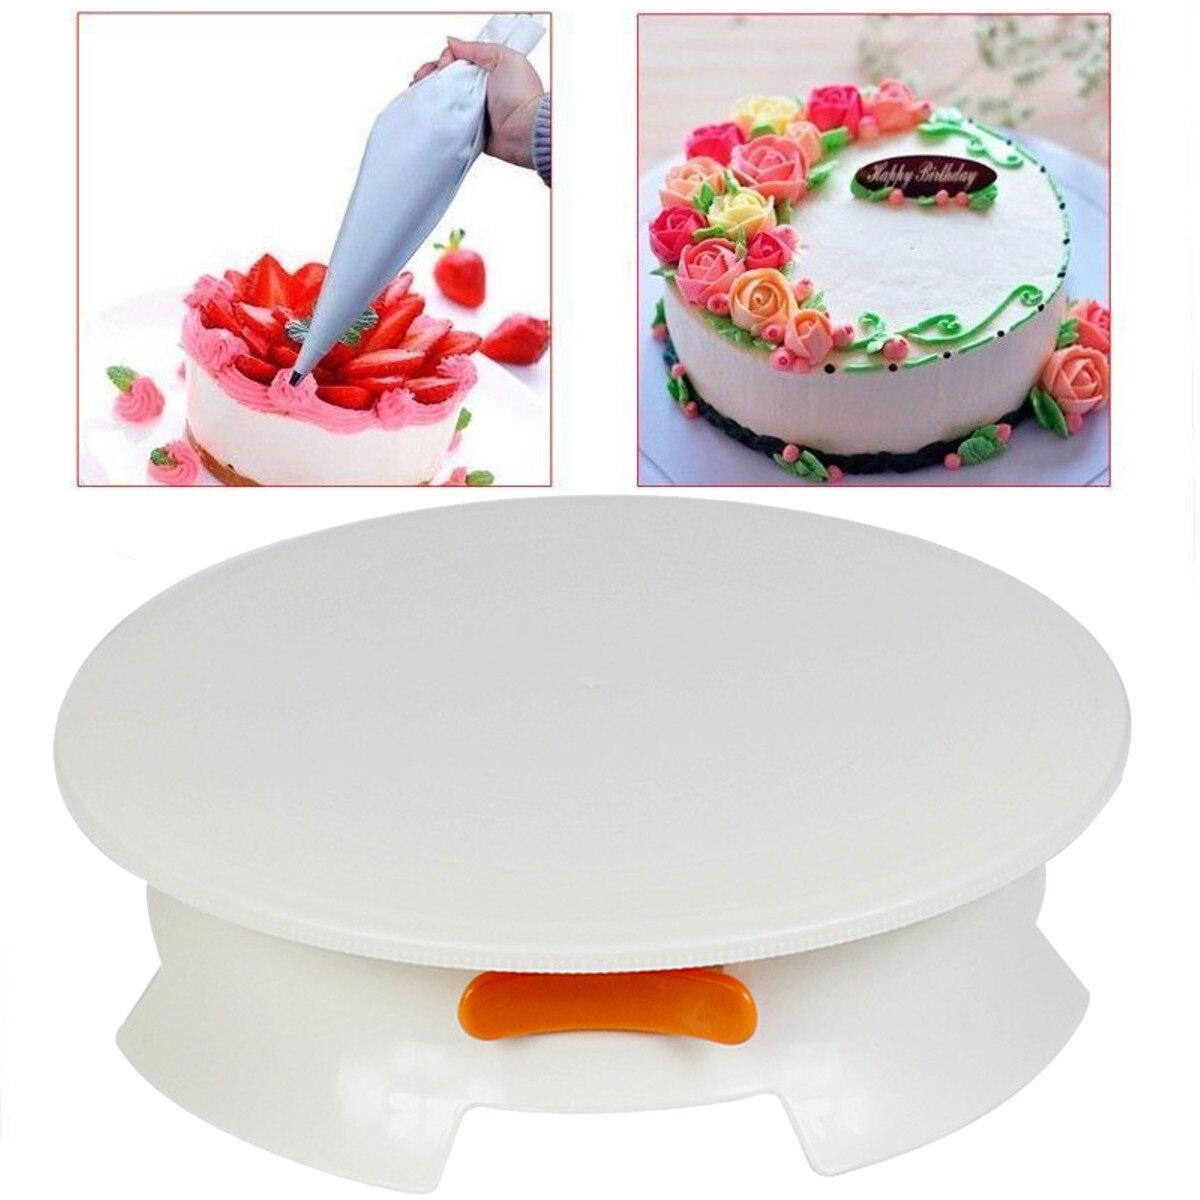 Turntables Turntable 12 Inch Cream Decorating Cake 360 Degree Lockable Round Display Revolving Rotating Swivel Plate Stand Platform Diy Cak